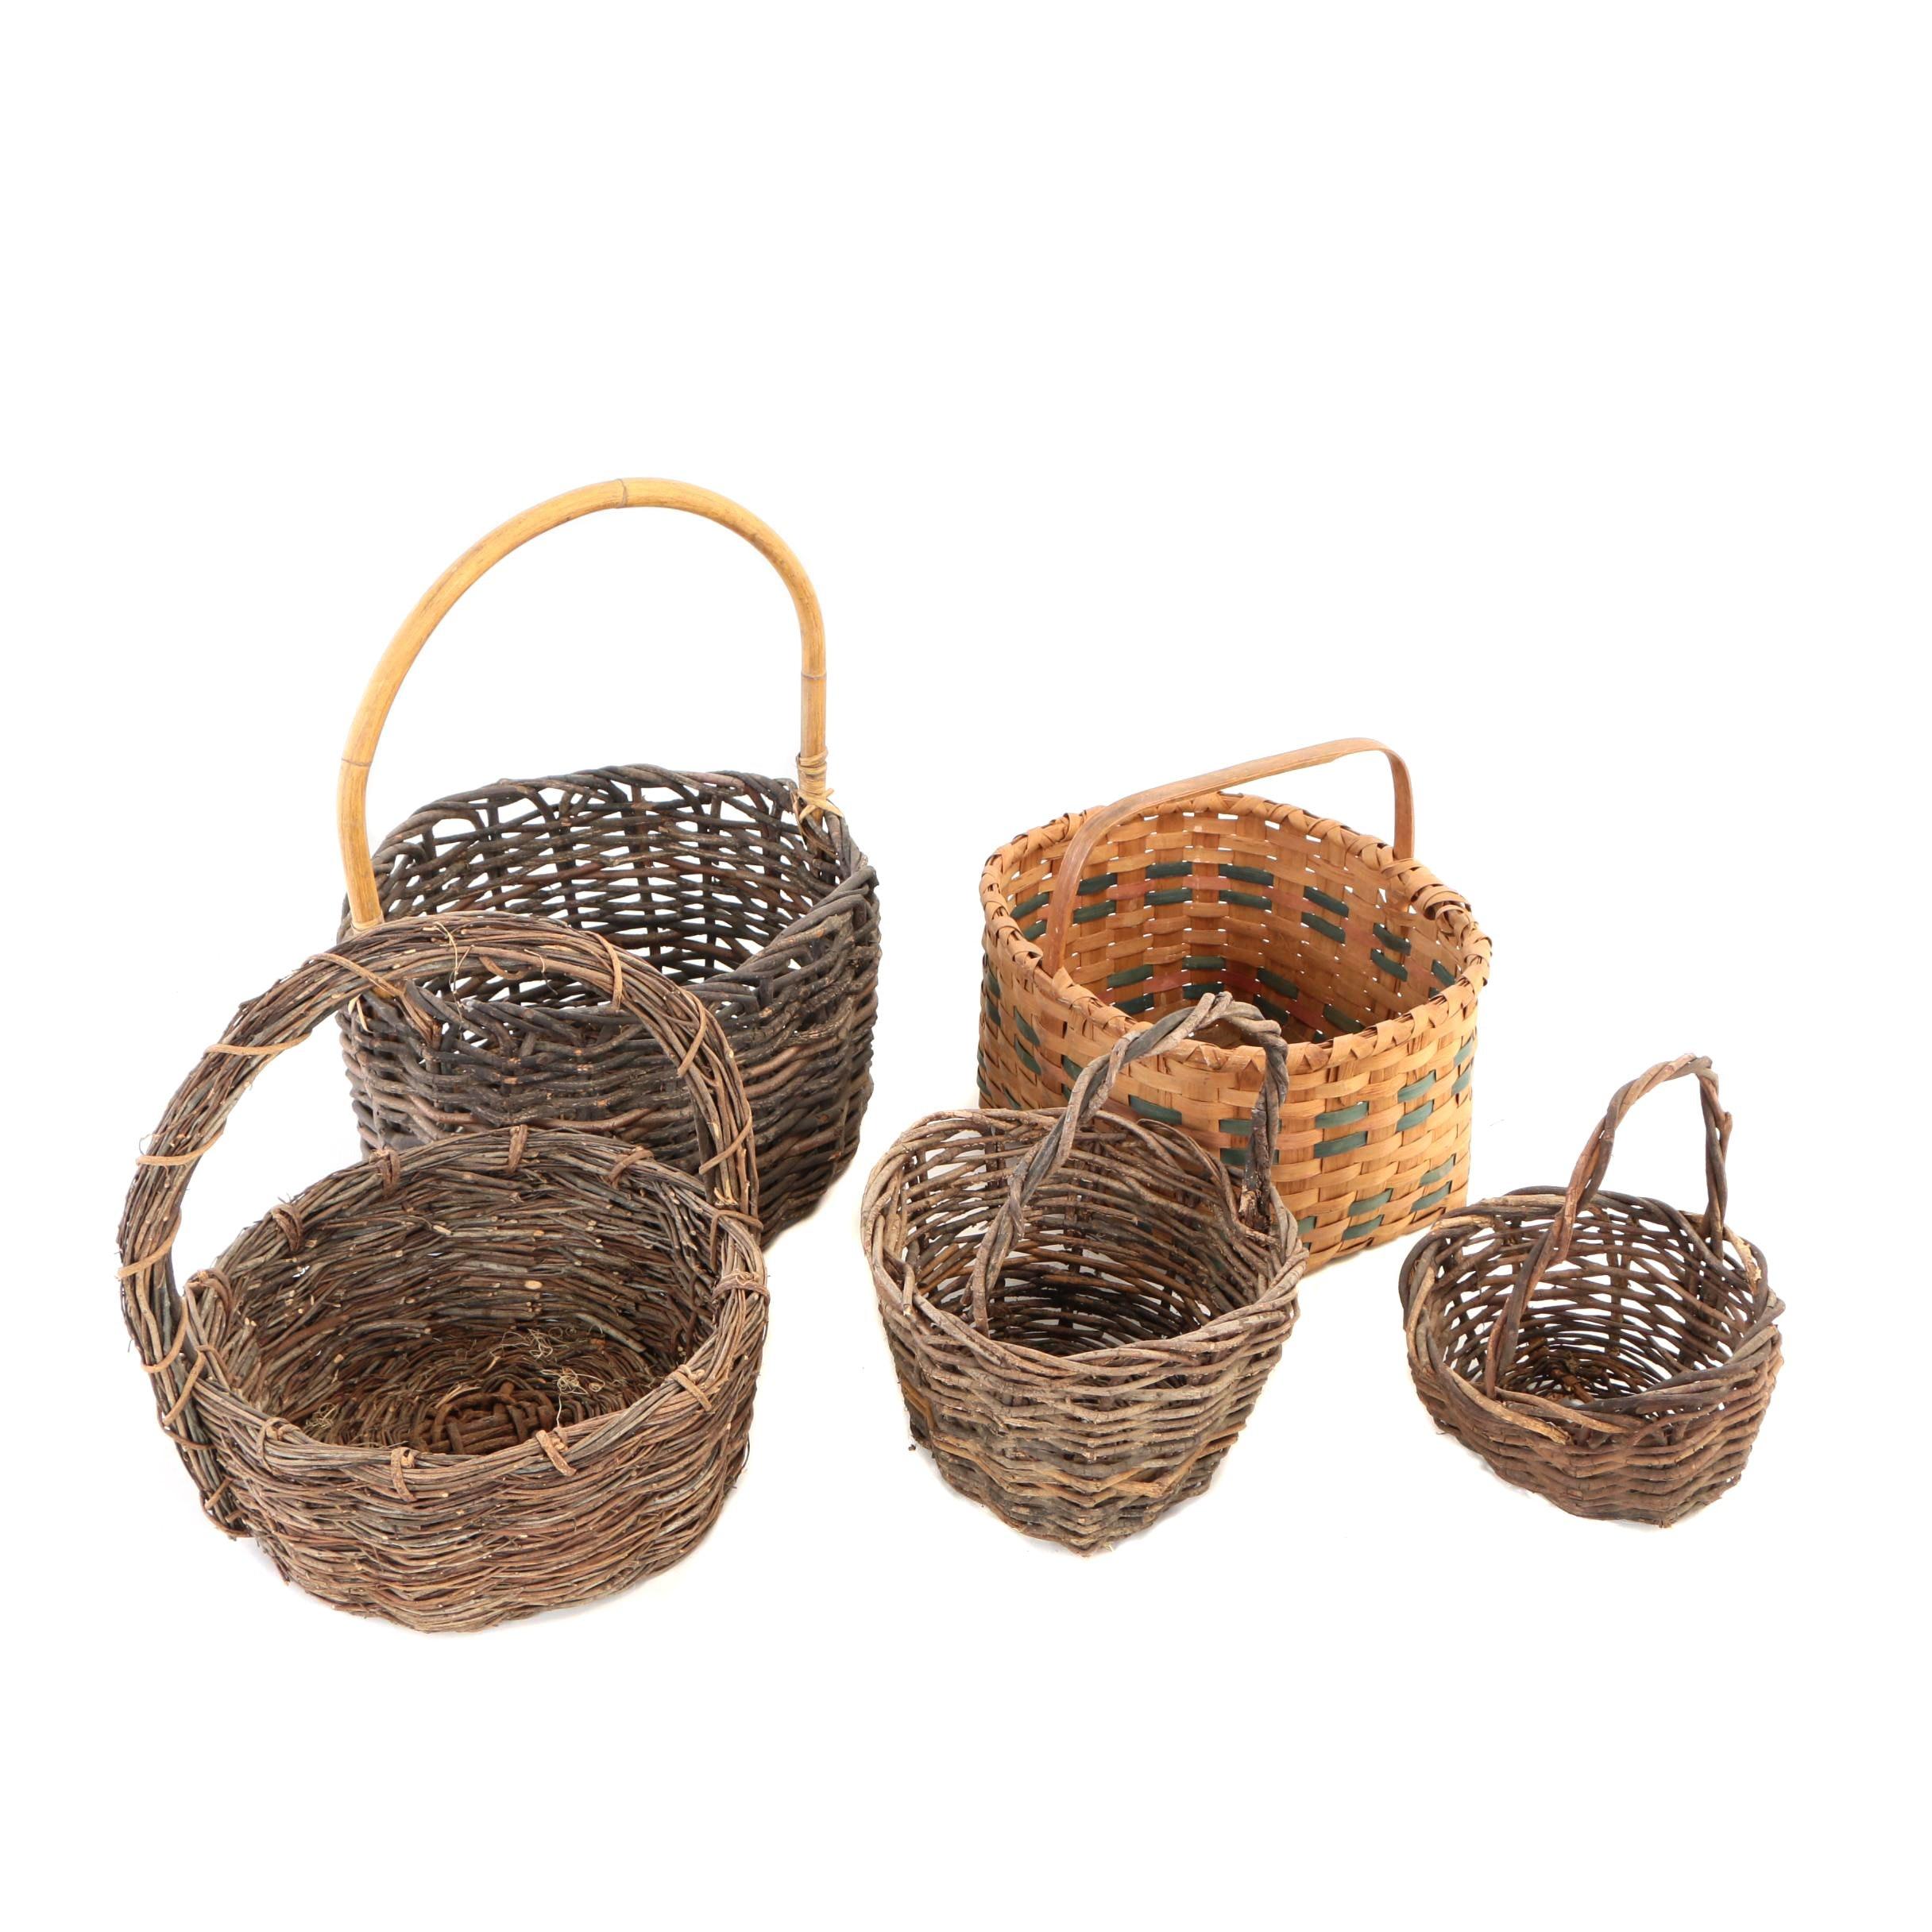 New England Style Splint Woven Basket and Handled Twig Baskets